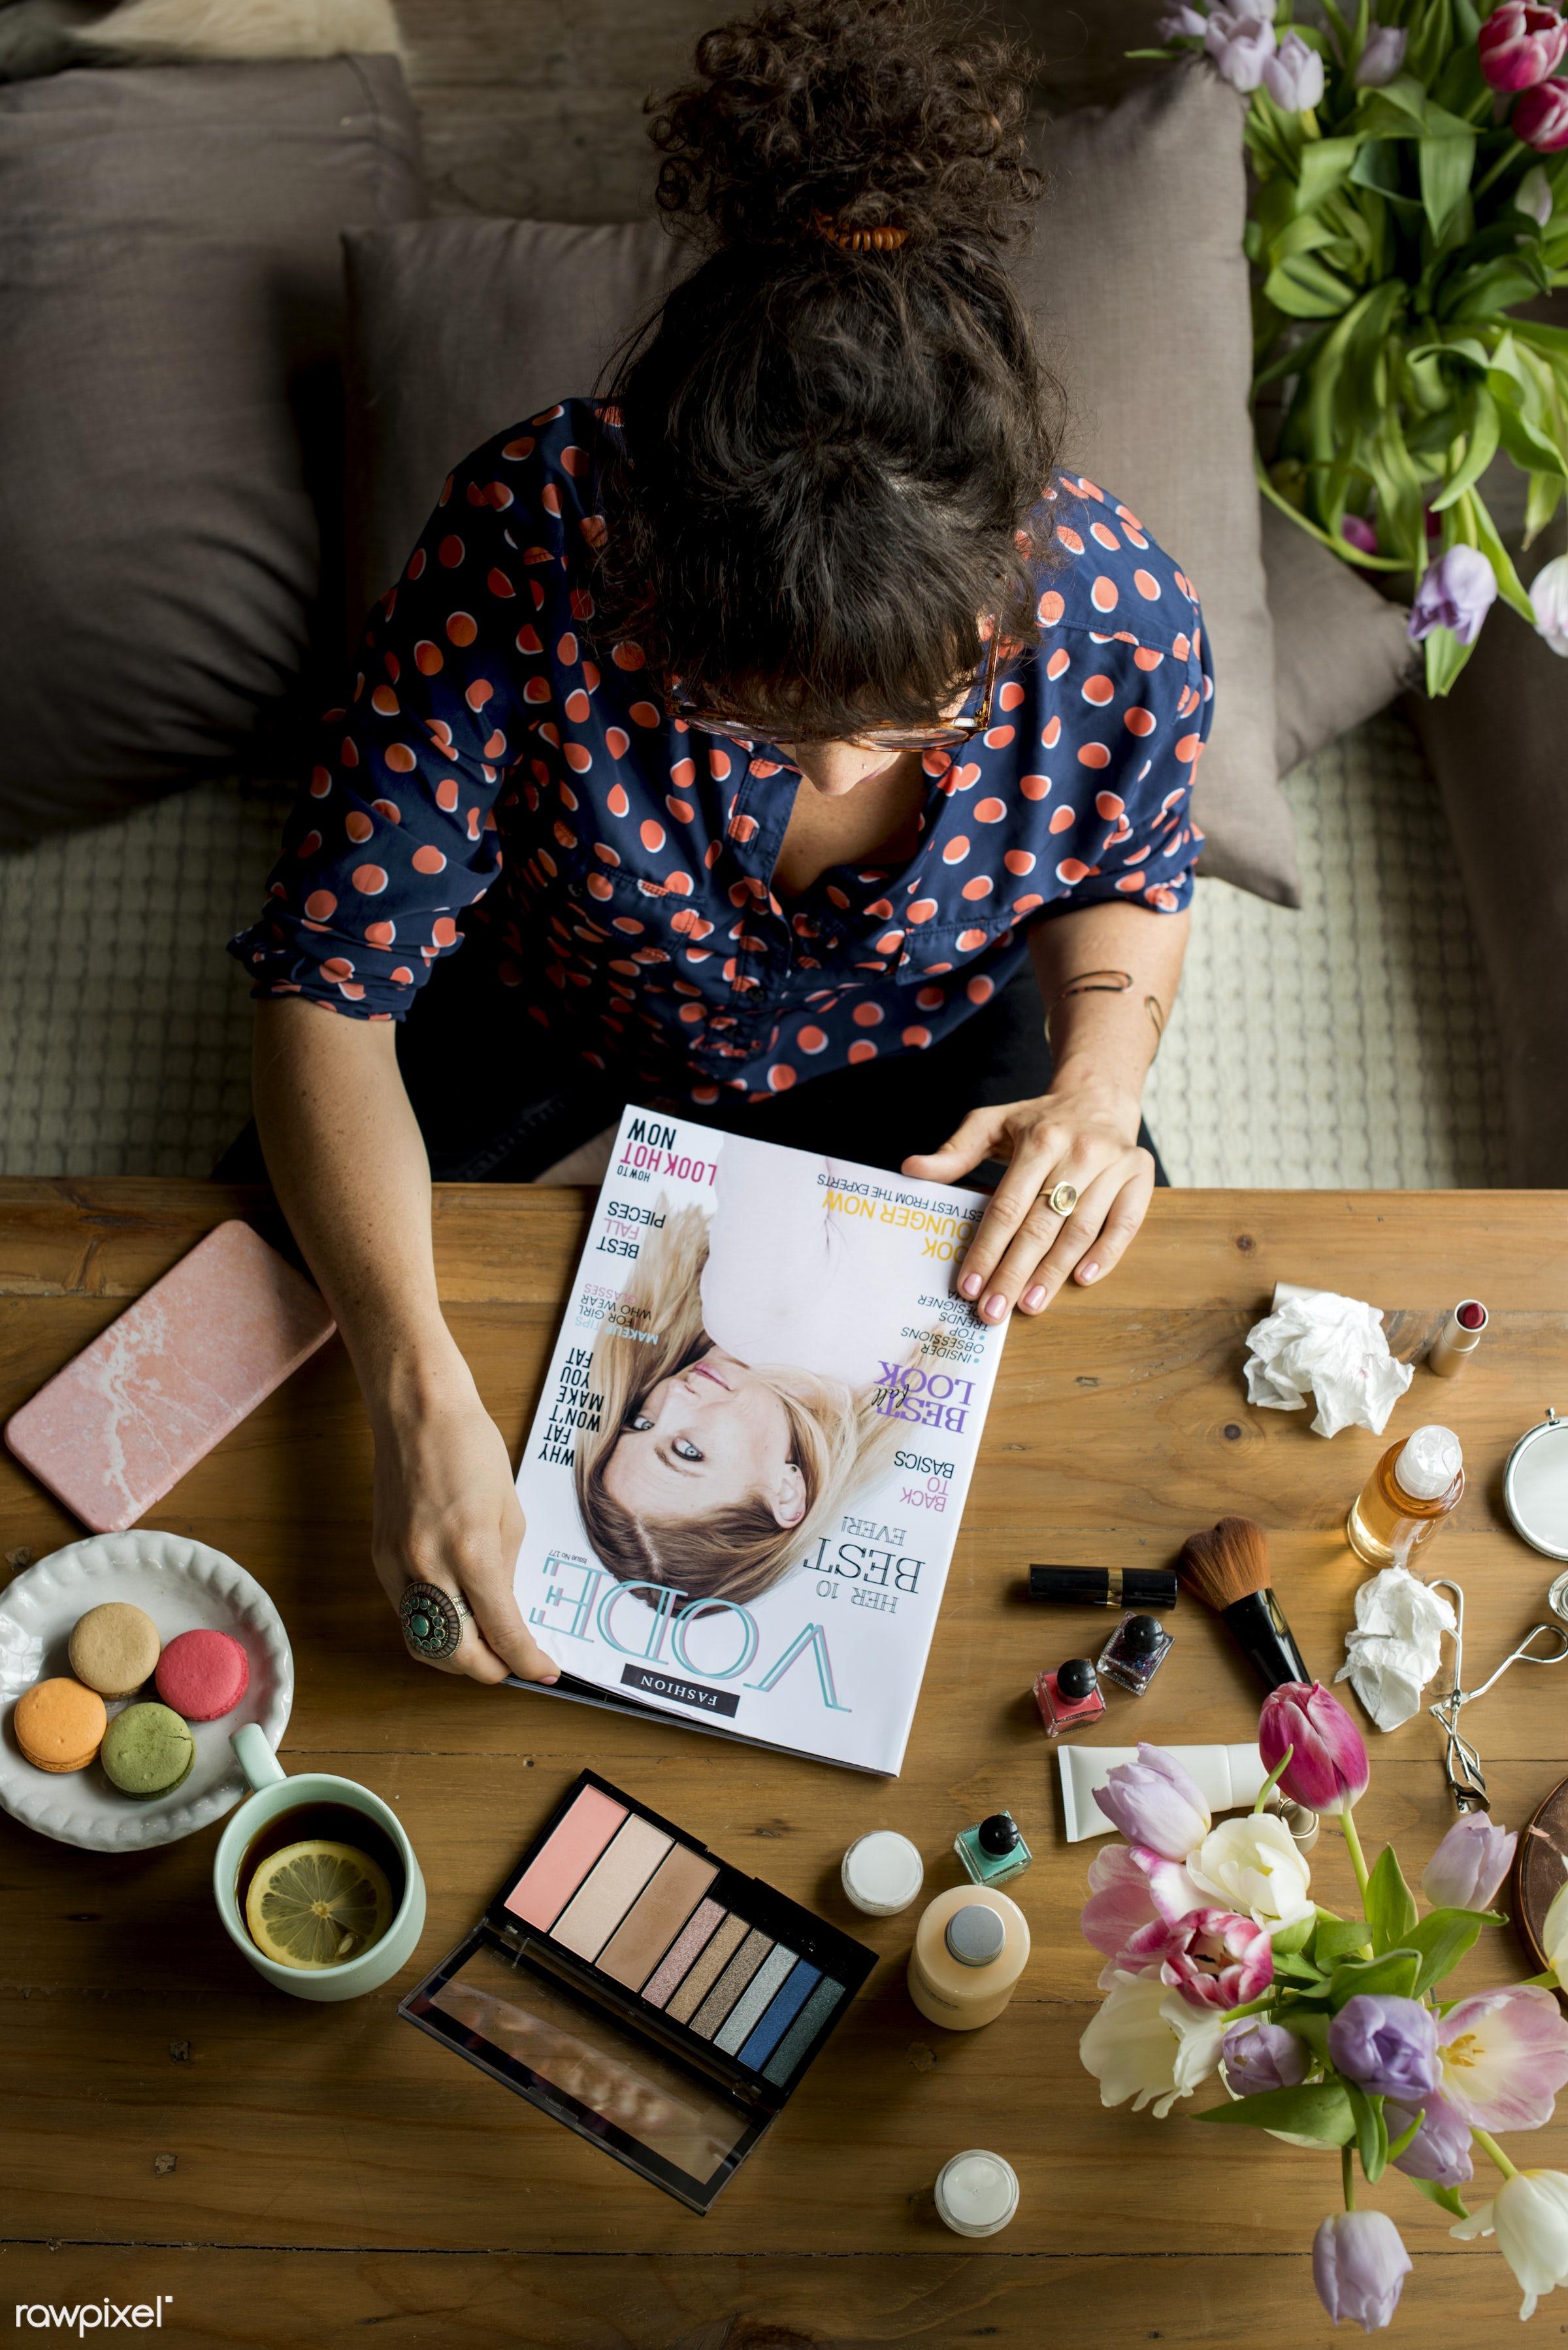 fashion, person, macaron, workspace, workplace, leaf, desk, beauty, tea, people, blossom, magazine, nature, fresh, woman,...